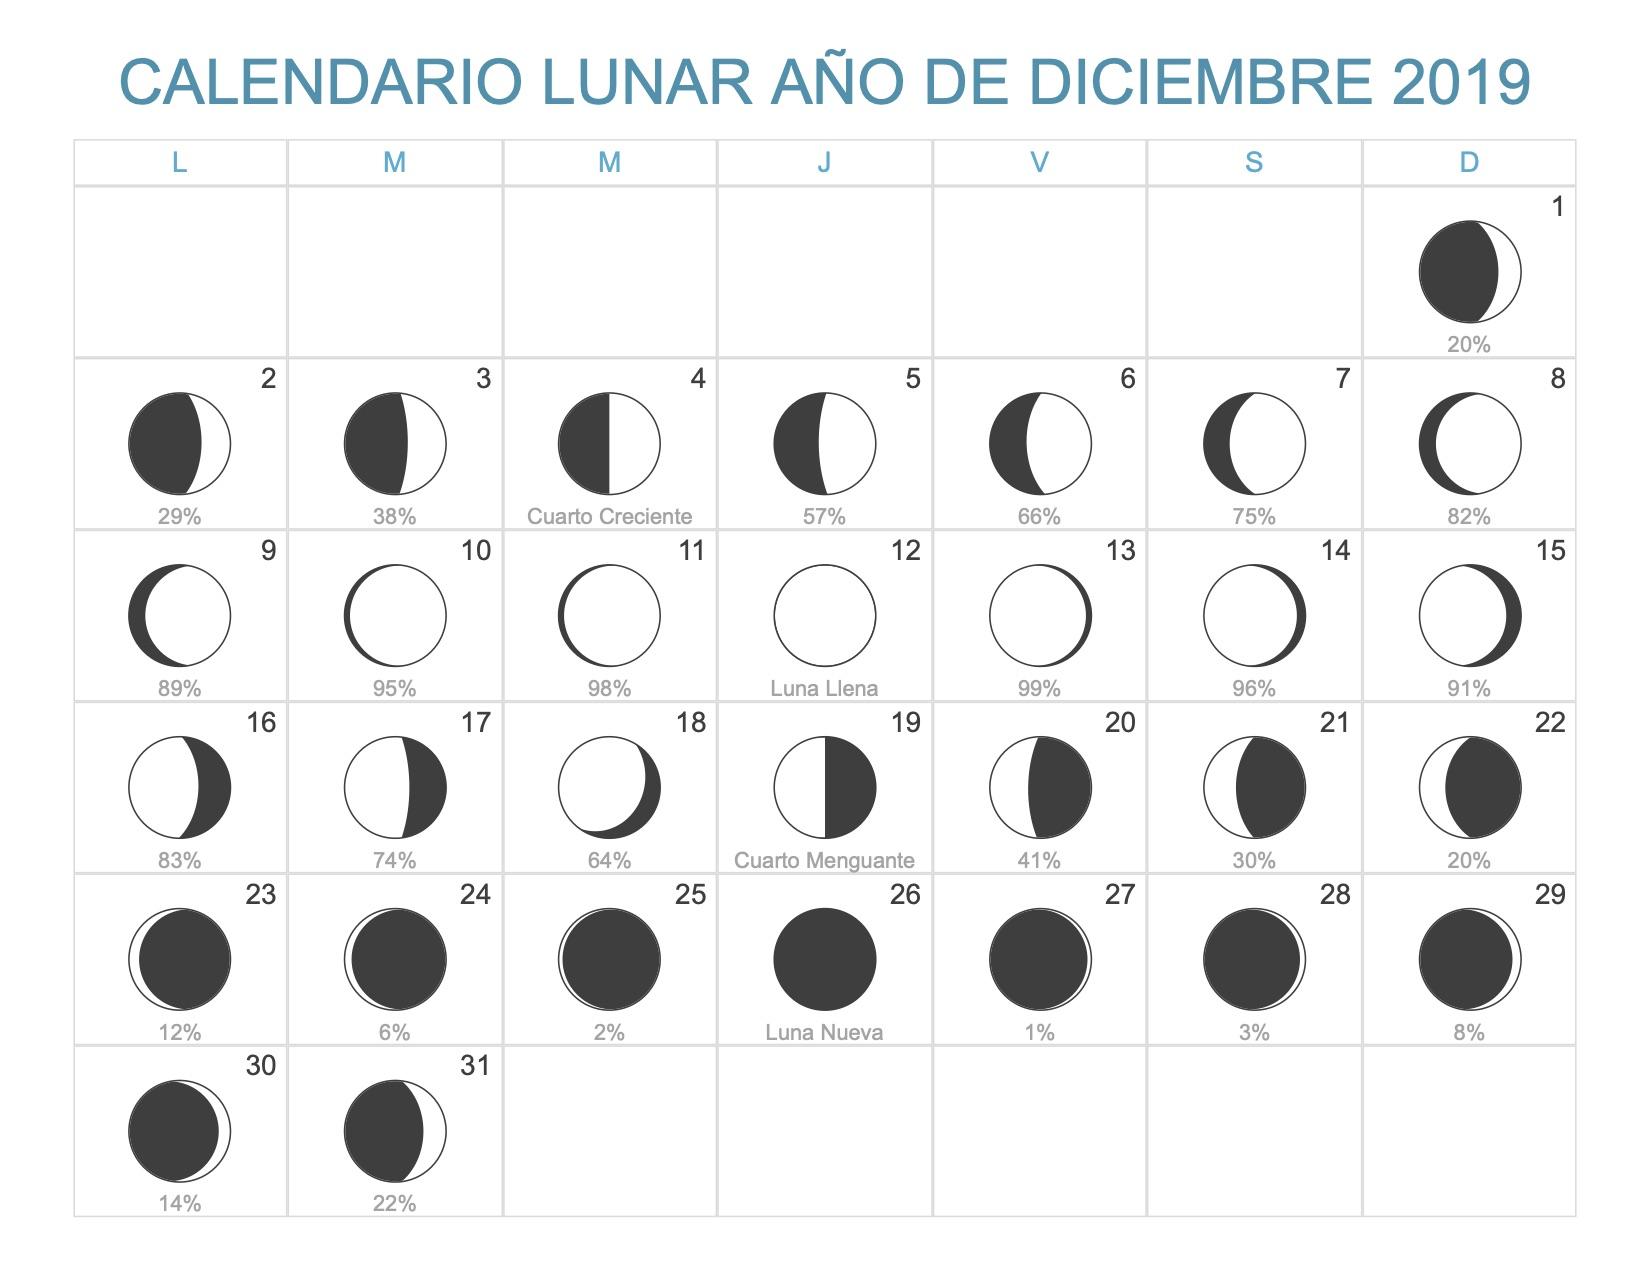 Calendario Diciembre 2019 Para Imprimir Argentina.Calendario Lunar Diciembre Ano 2019 Fases Lunares